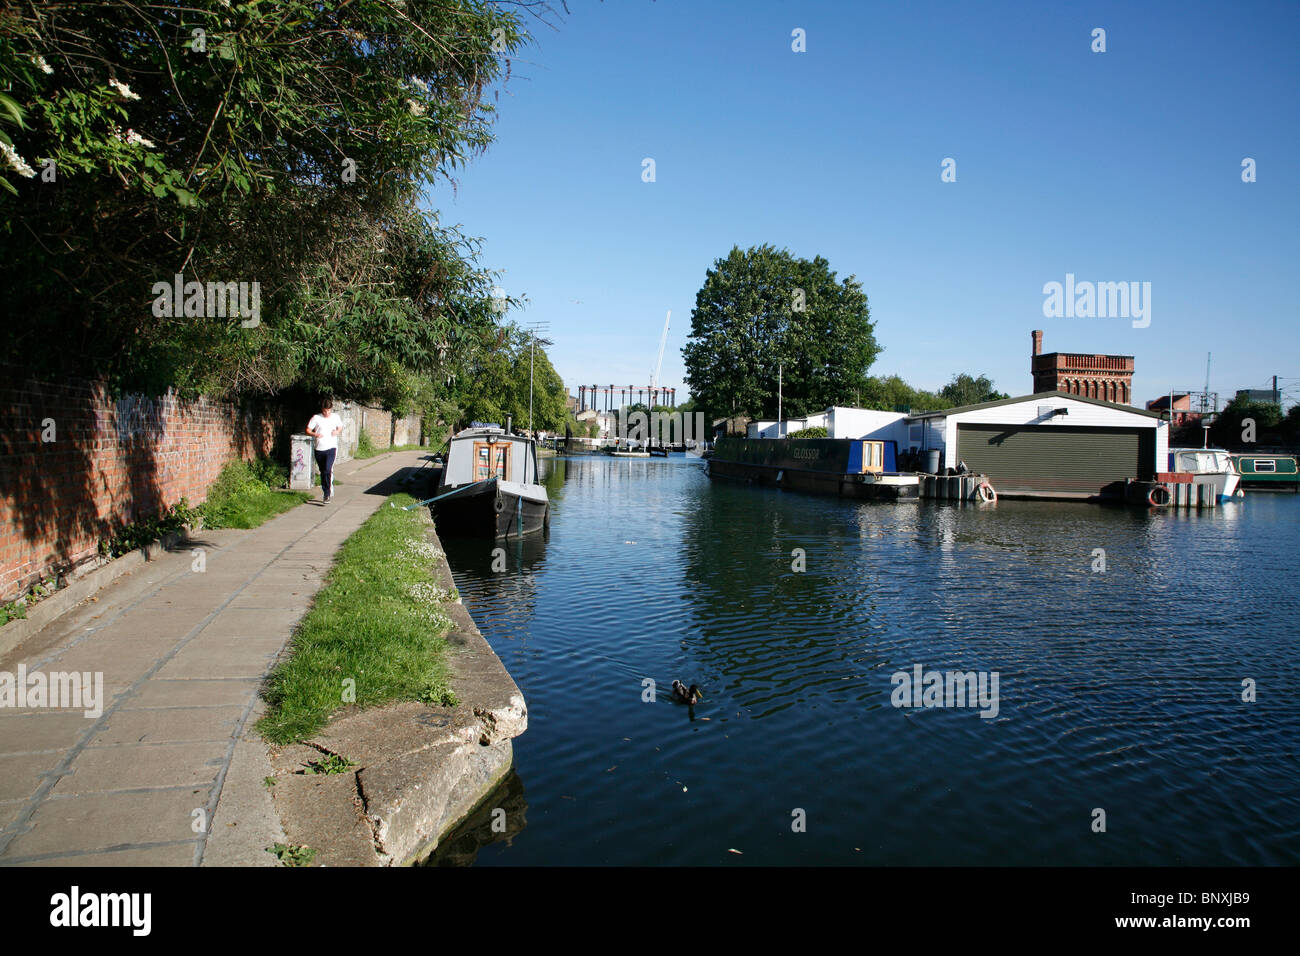 Looking along Regent's Canal to St Pancras Lock, St Pancras, London, UK - Stock Image